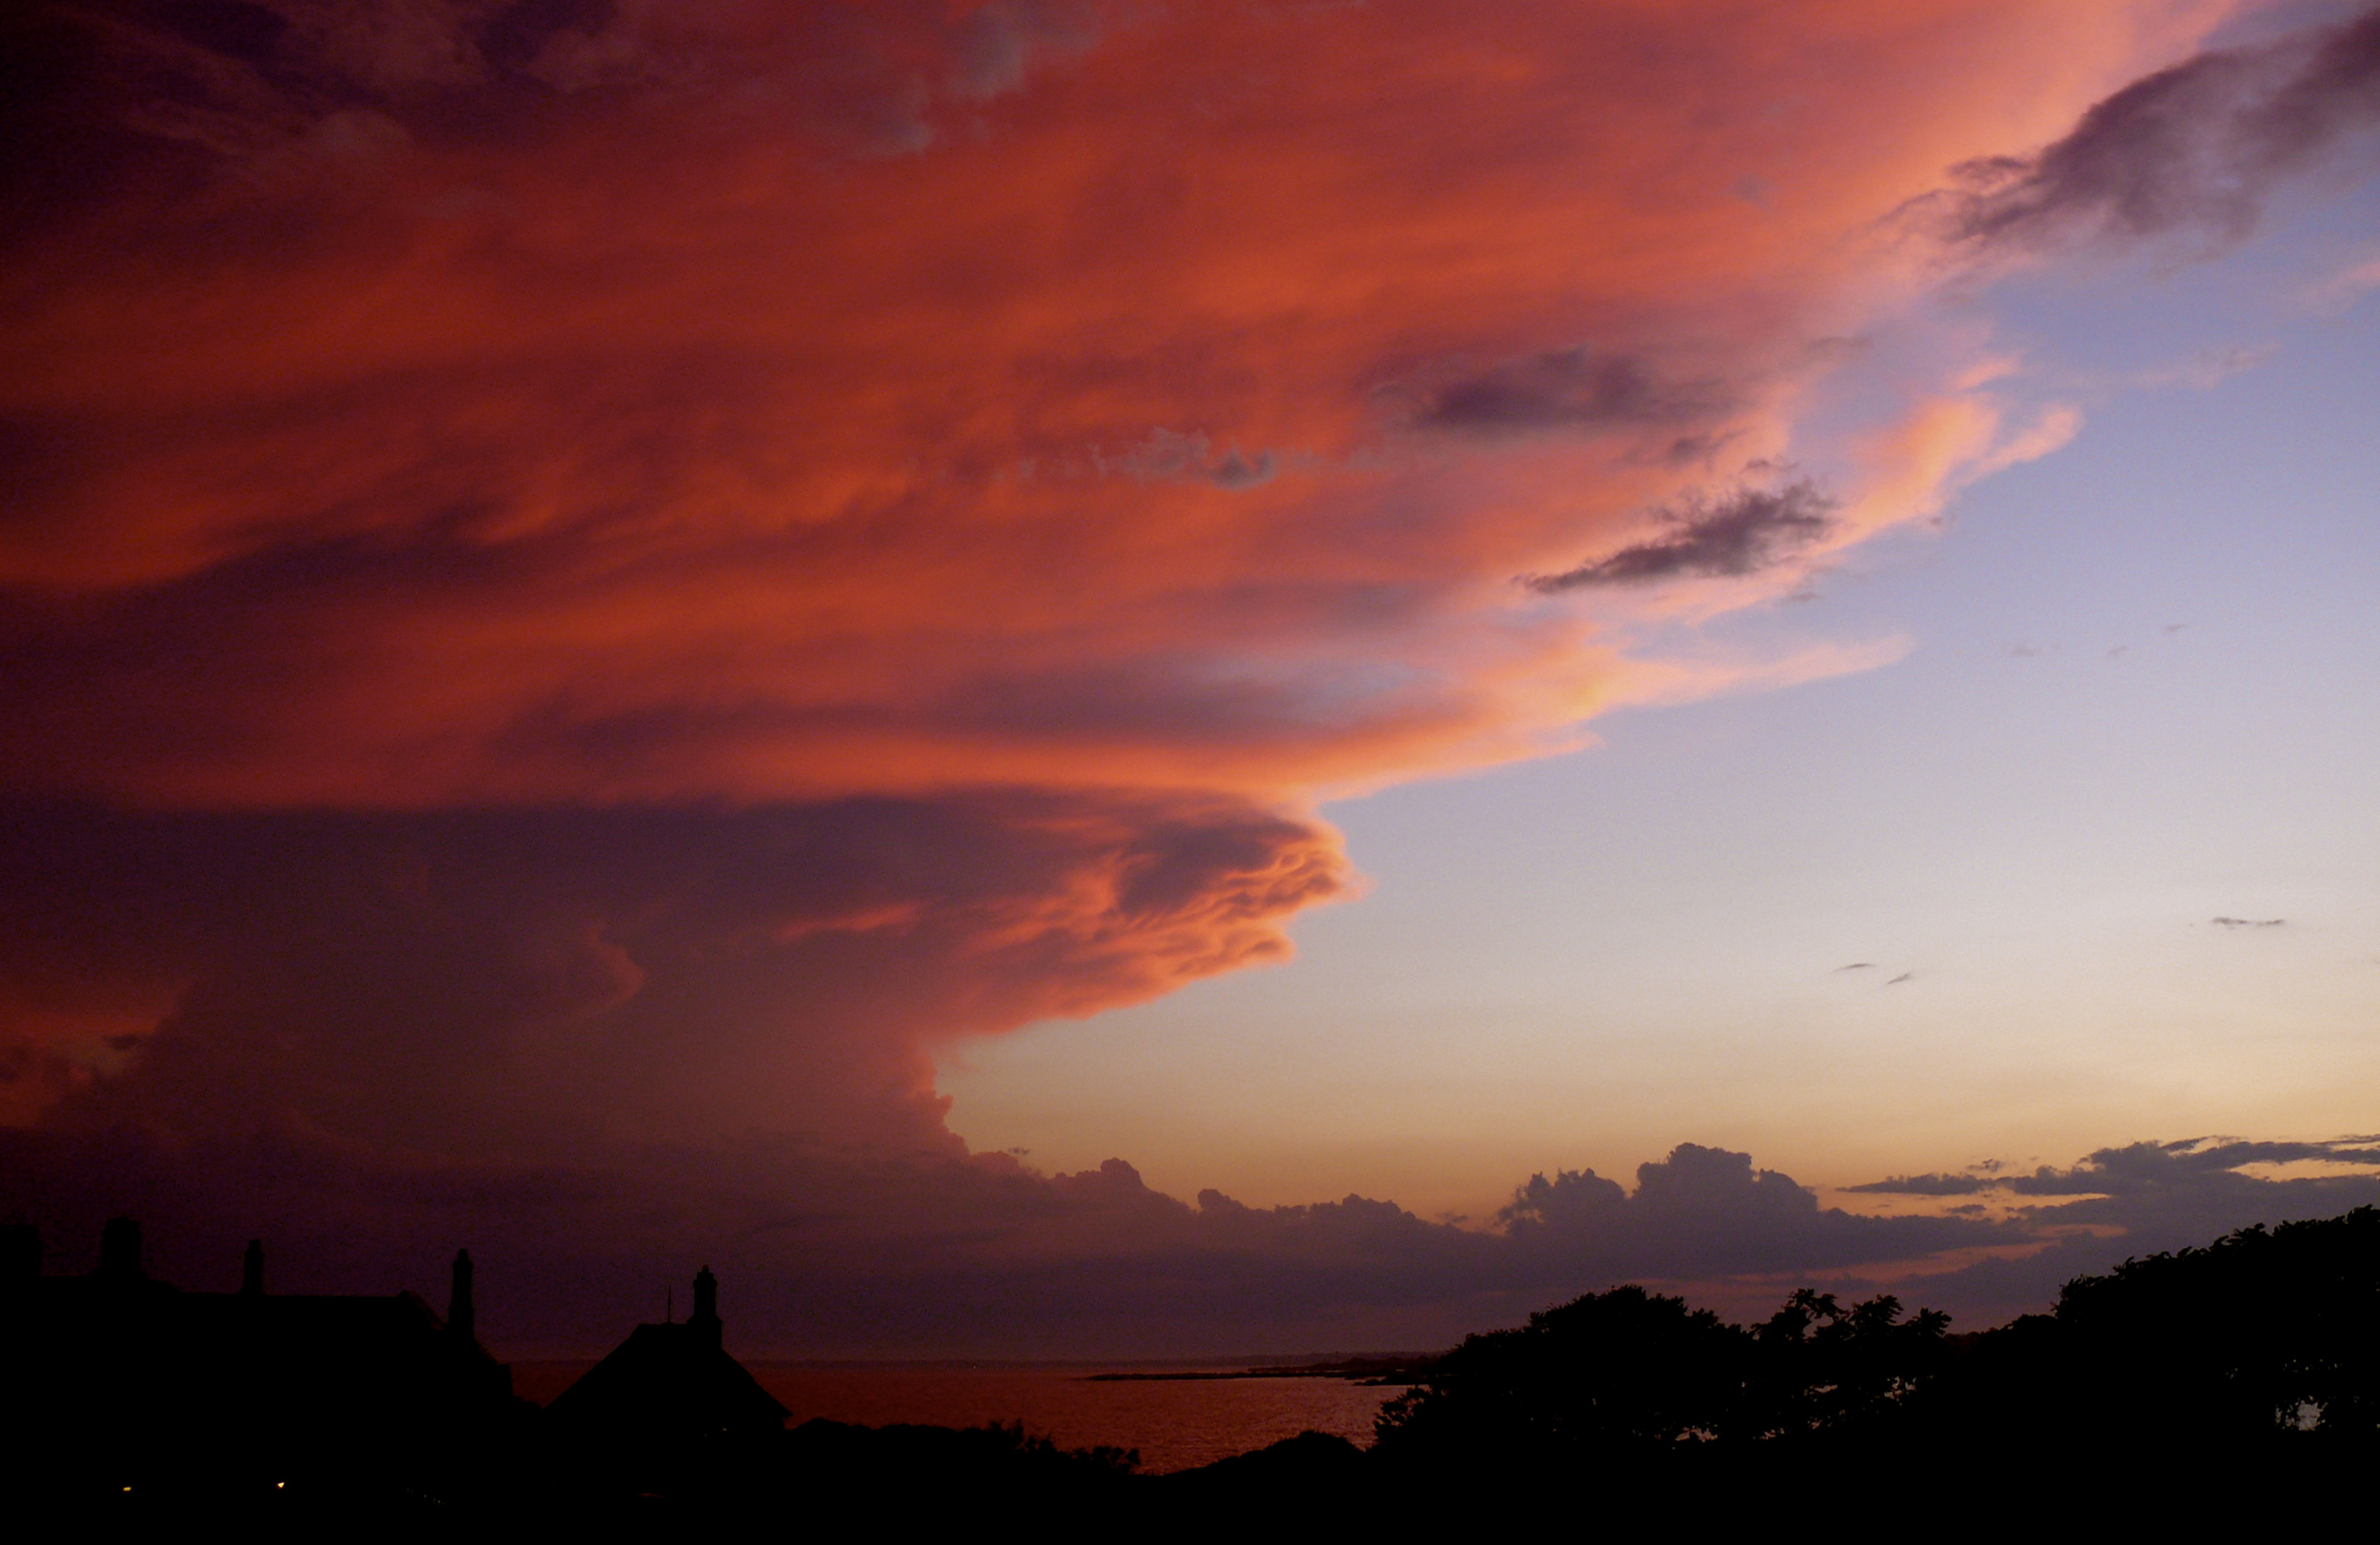 NE_SunsetSkyline_036.jpg